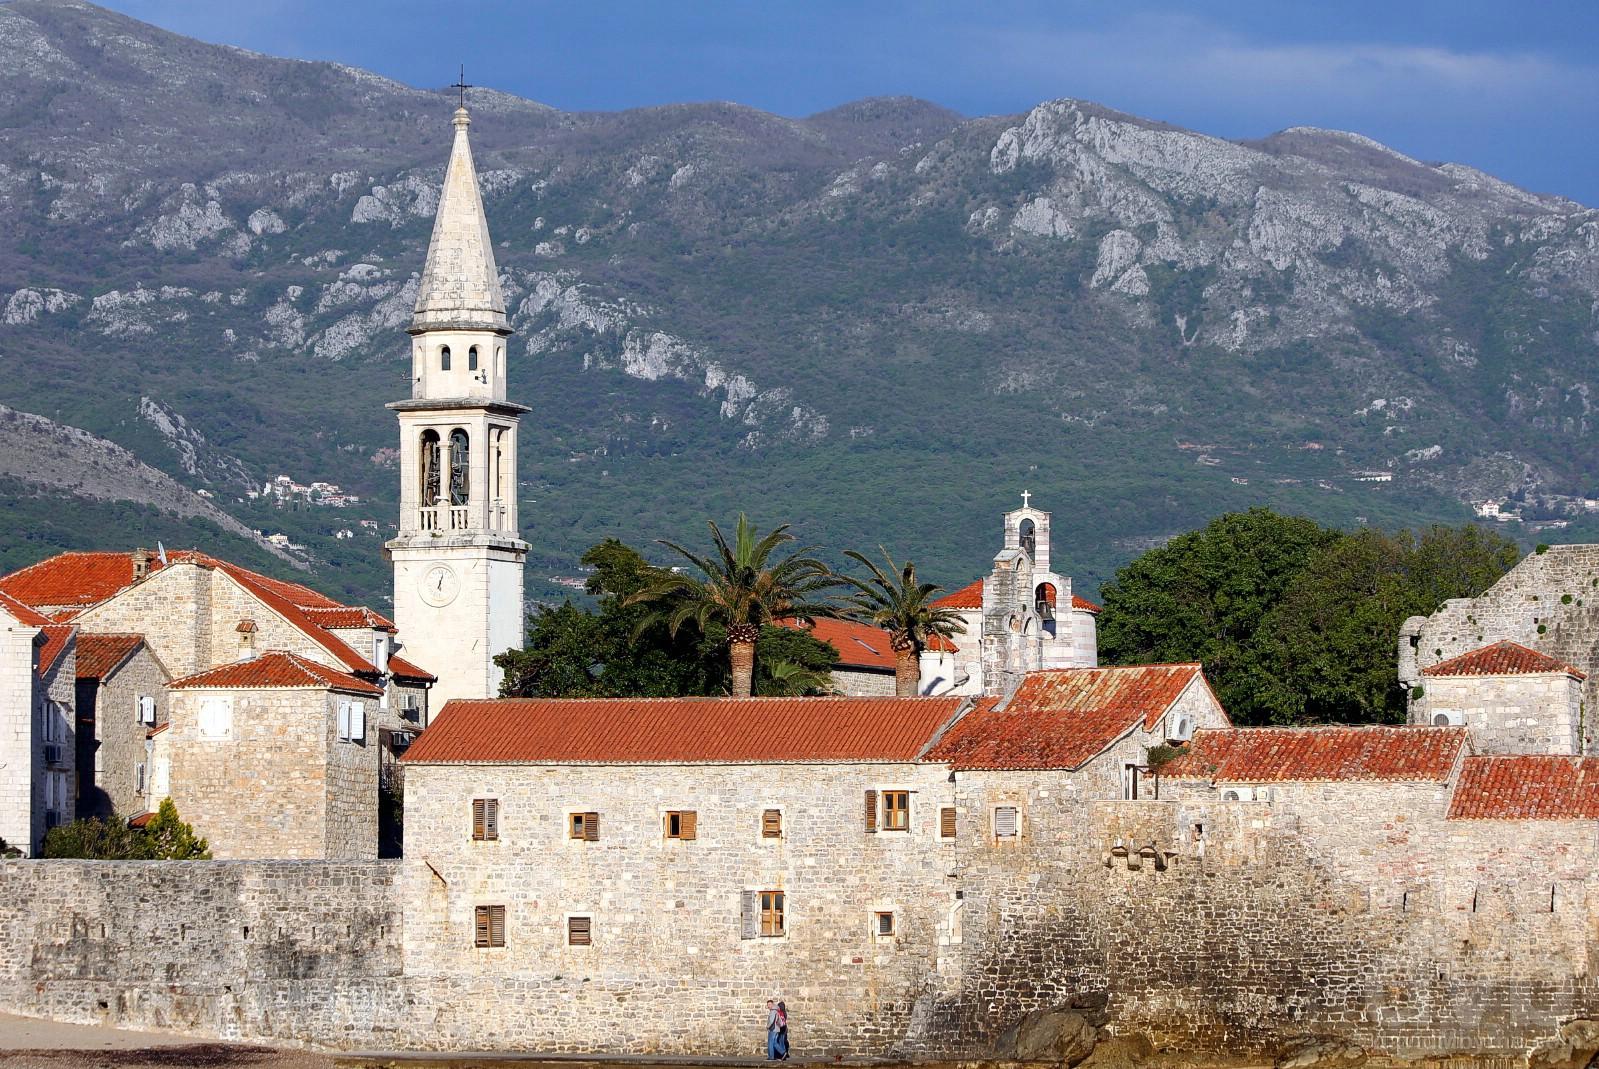 Outside the walls of Stari Grad (Old Town), Budva, Montenegro. April 20, 2017.